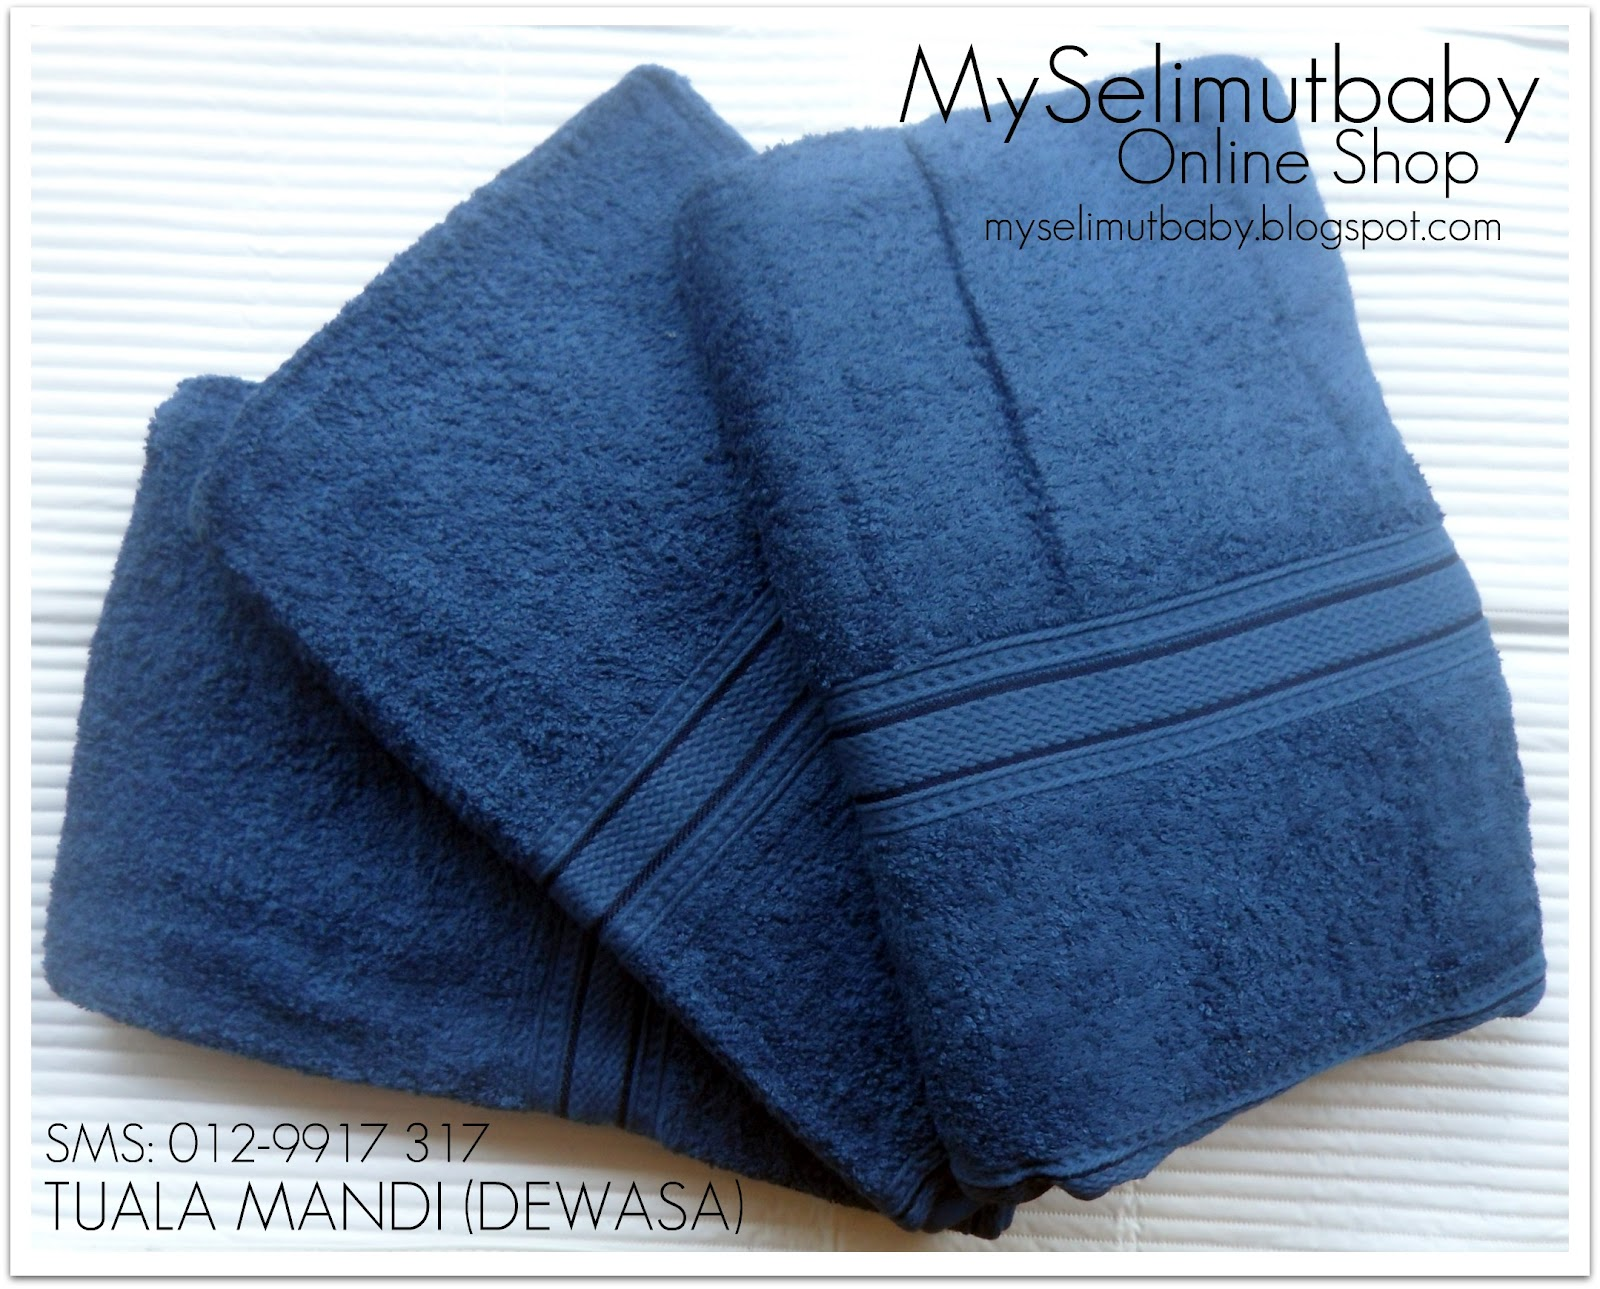 Tuala Mandi Dewasa Myselimutbaby Online Shop